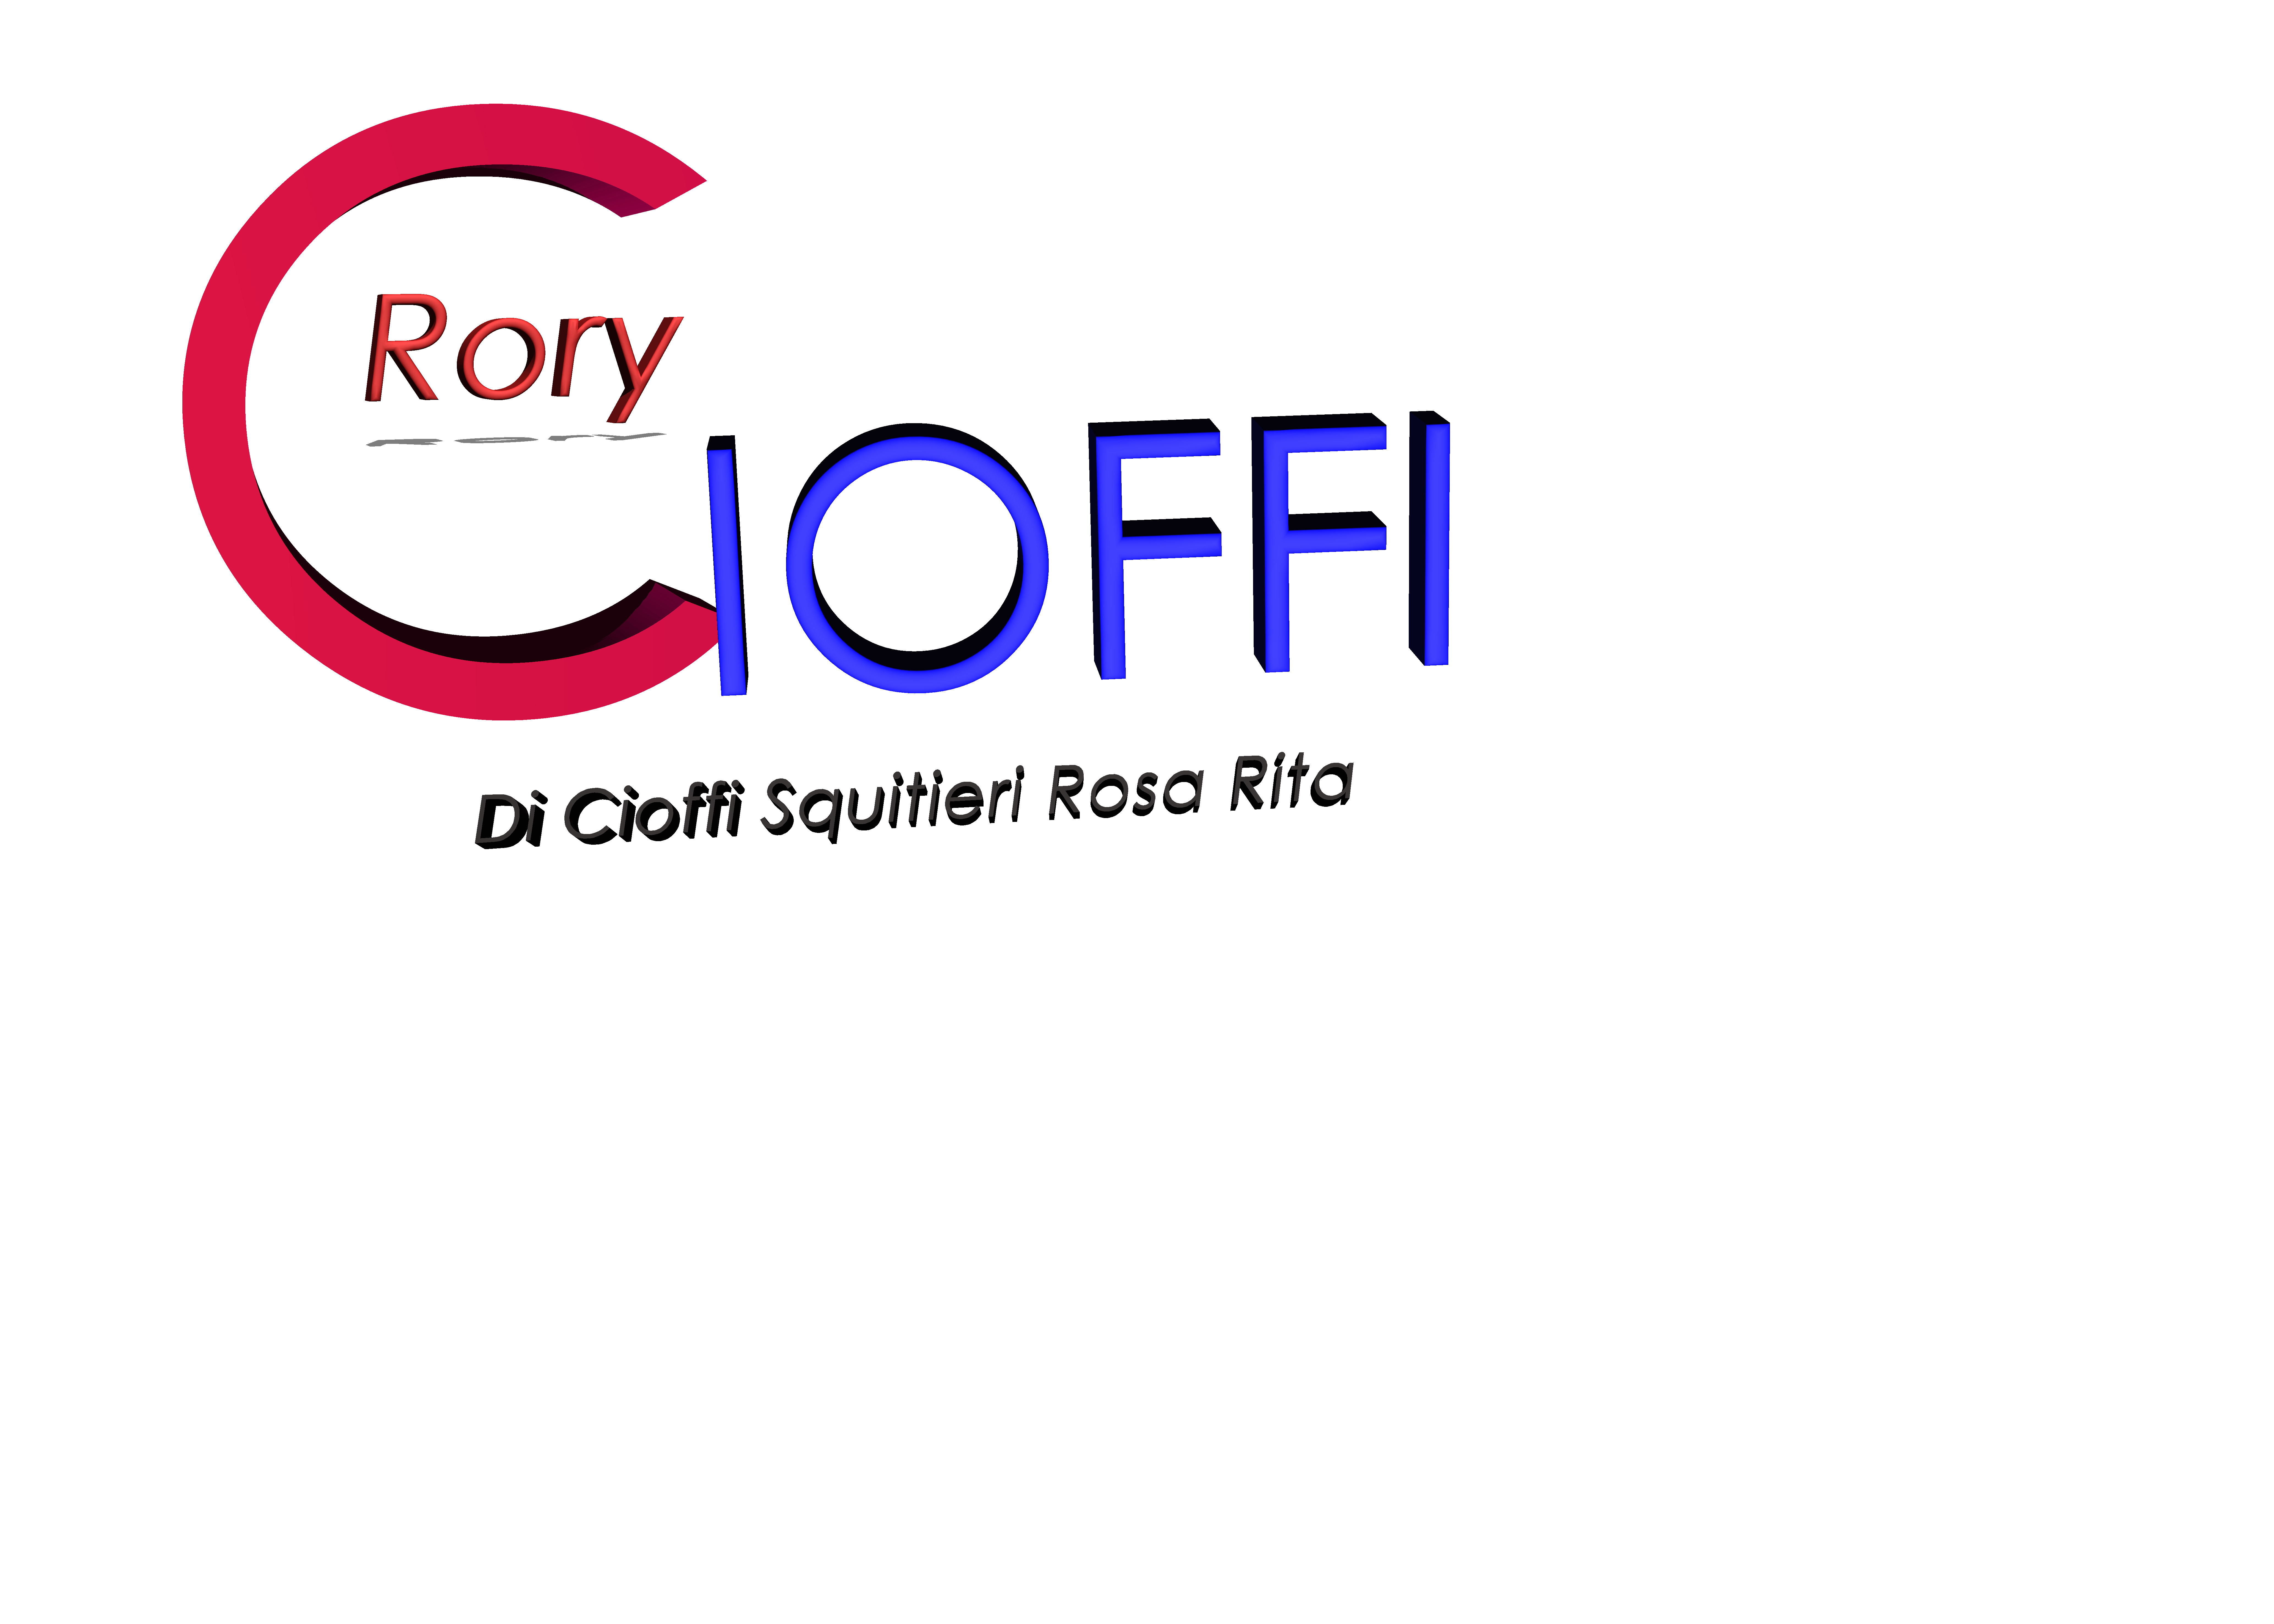 Rory Cioffi, di Cioffi Squitieri Rosa Rita